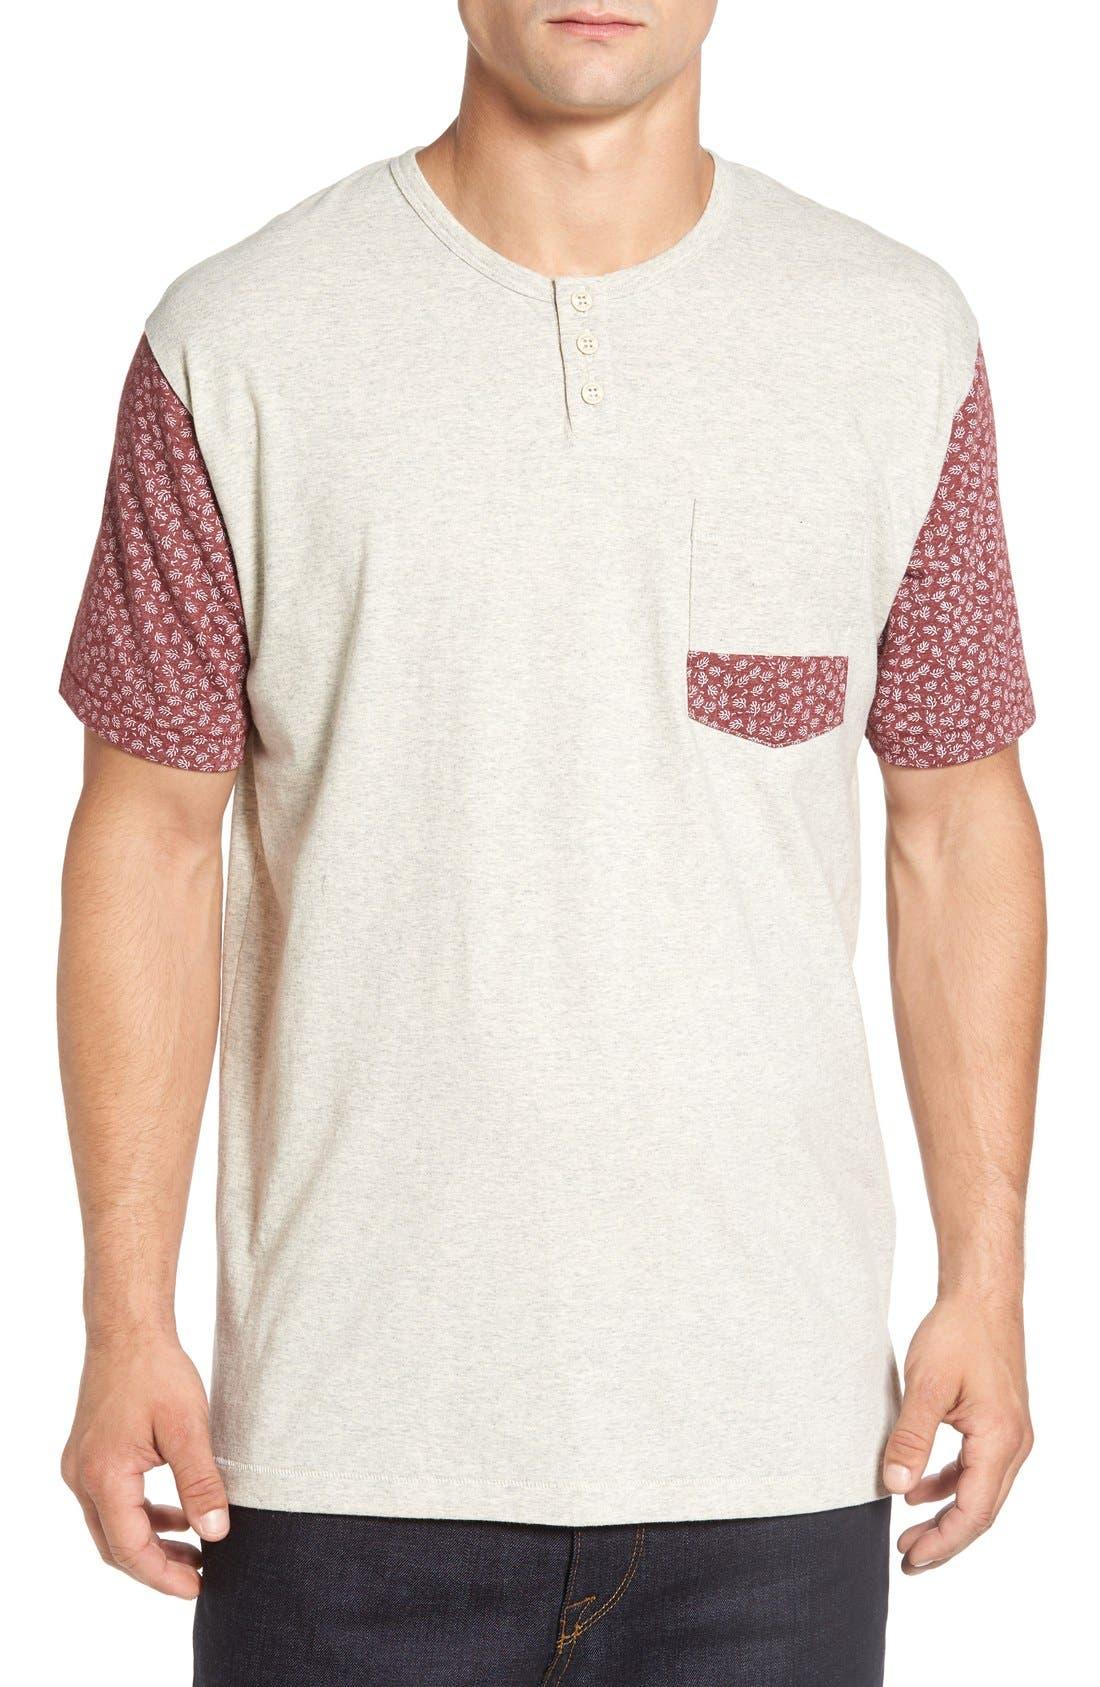 Imperial Motion 'Harper' Short Sleeve Pocket Henley T-Shirt